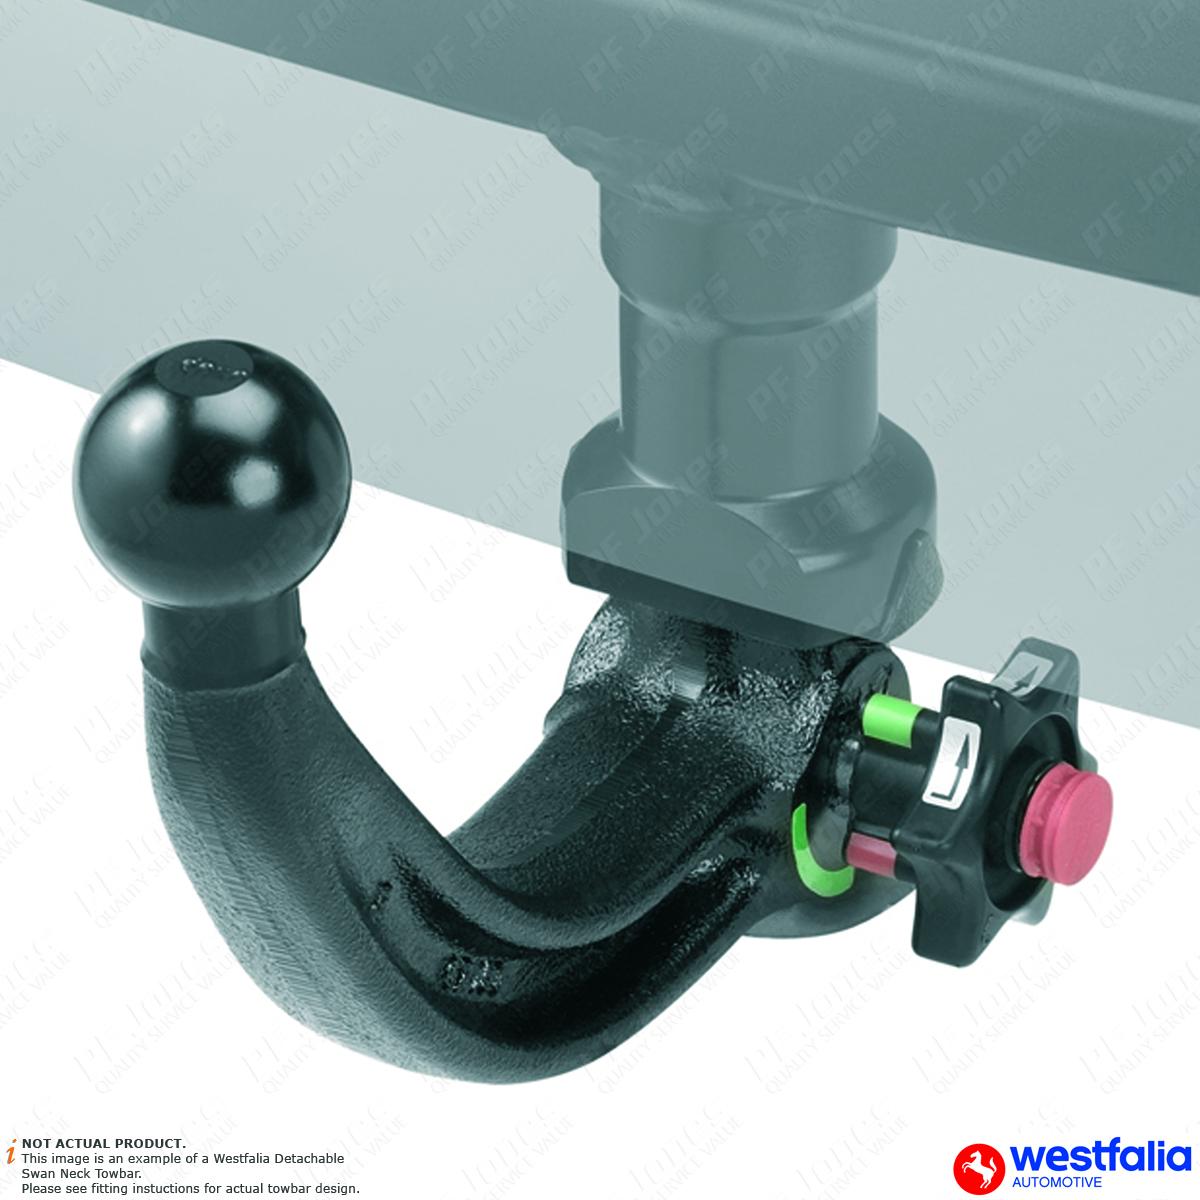 Westfalia detachable towbar